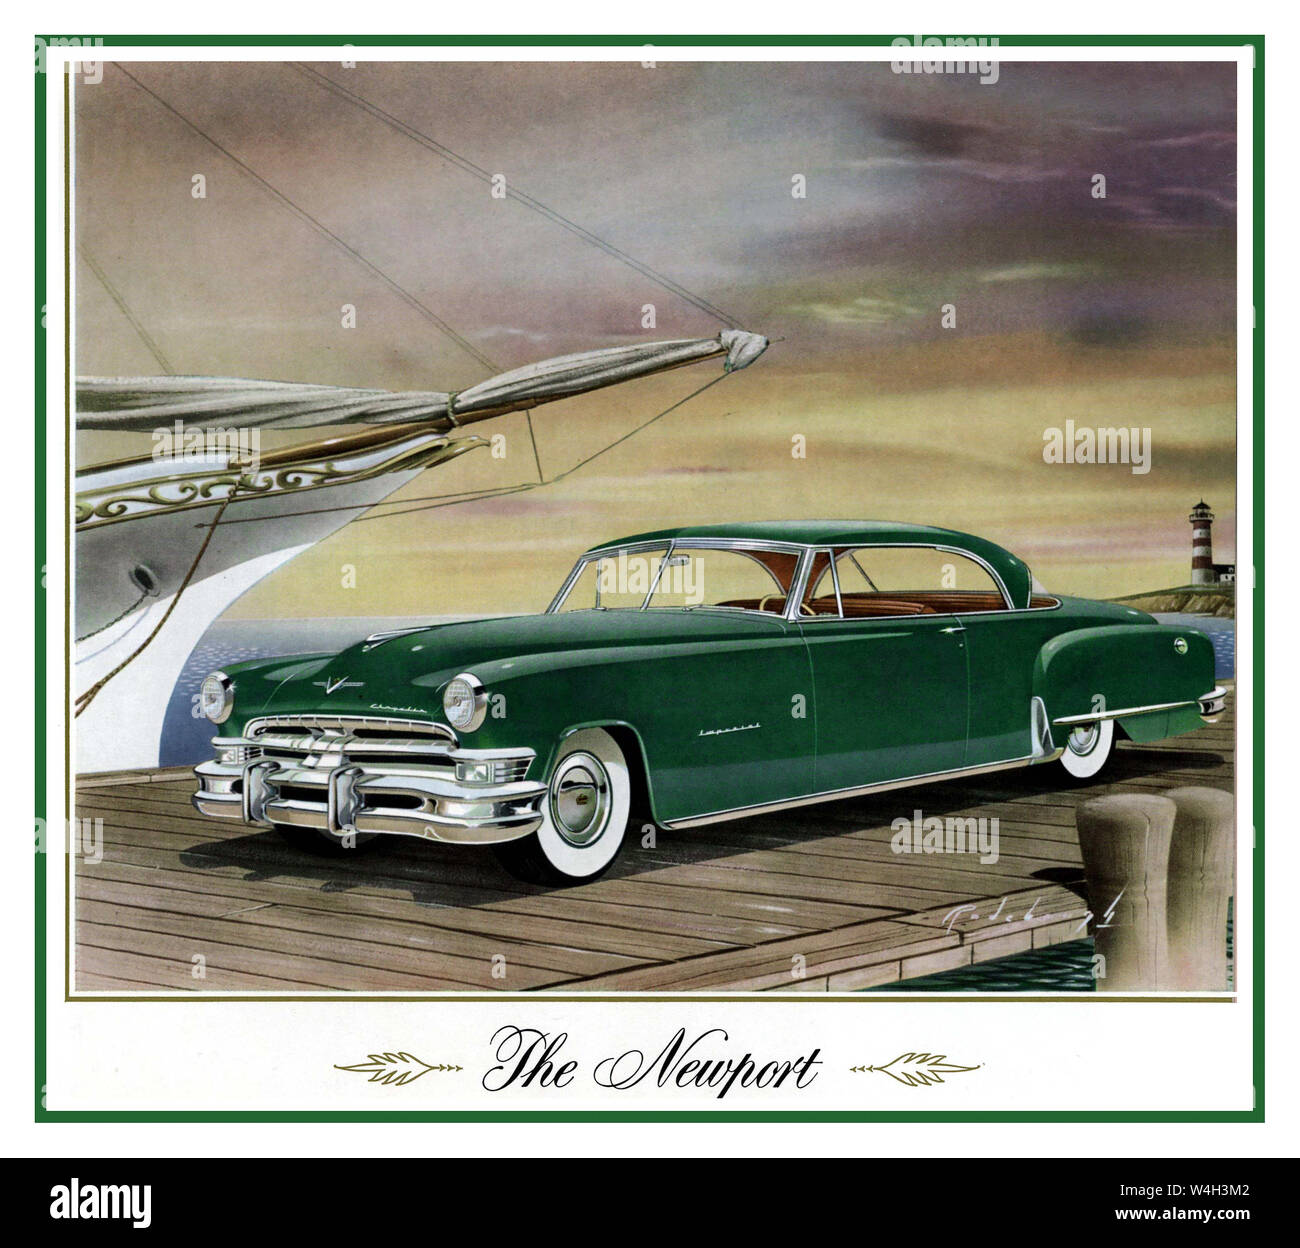 1957 DODGE SWEPT WING ROYAL LANCER 2 DOOR A3 POSTER AD  ADVERTISEMENT BROCHURE